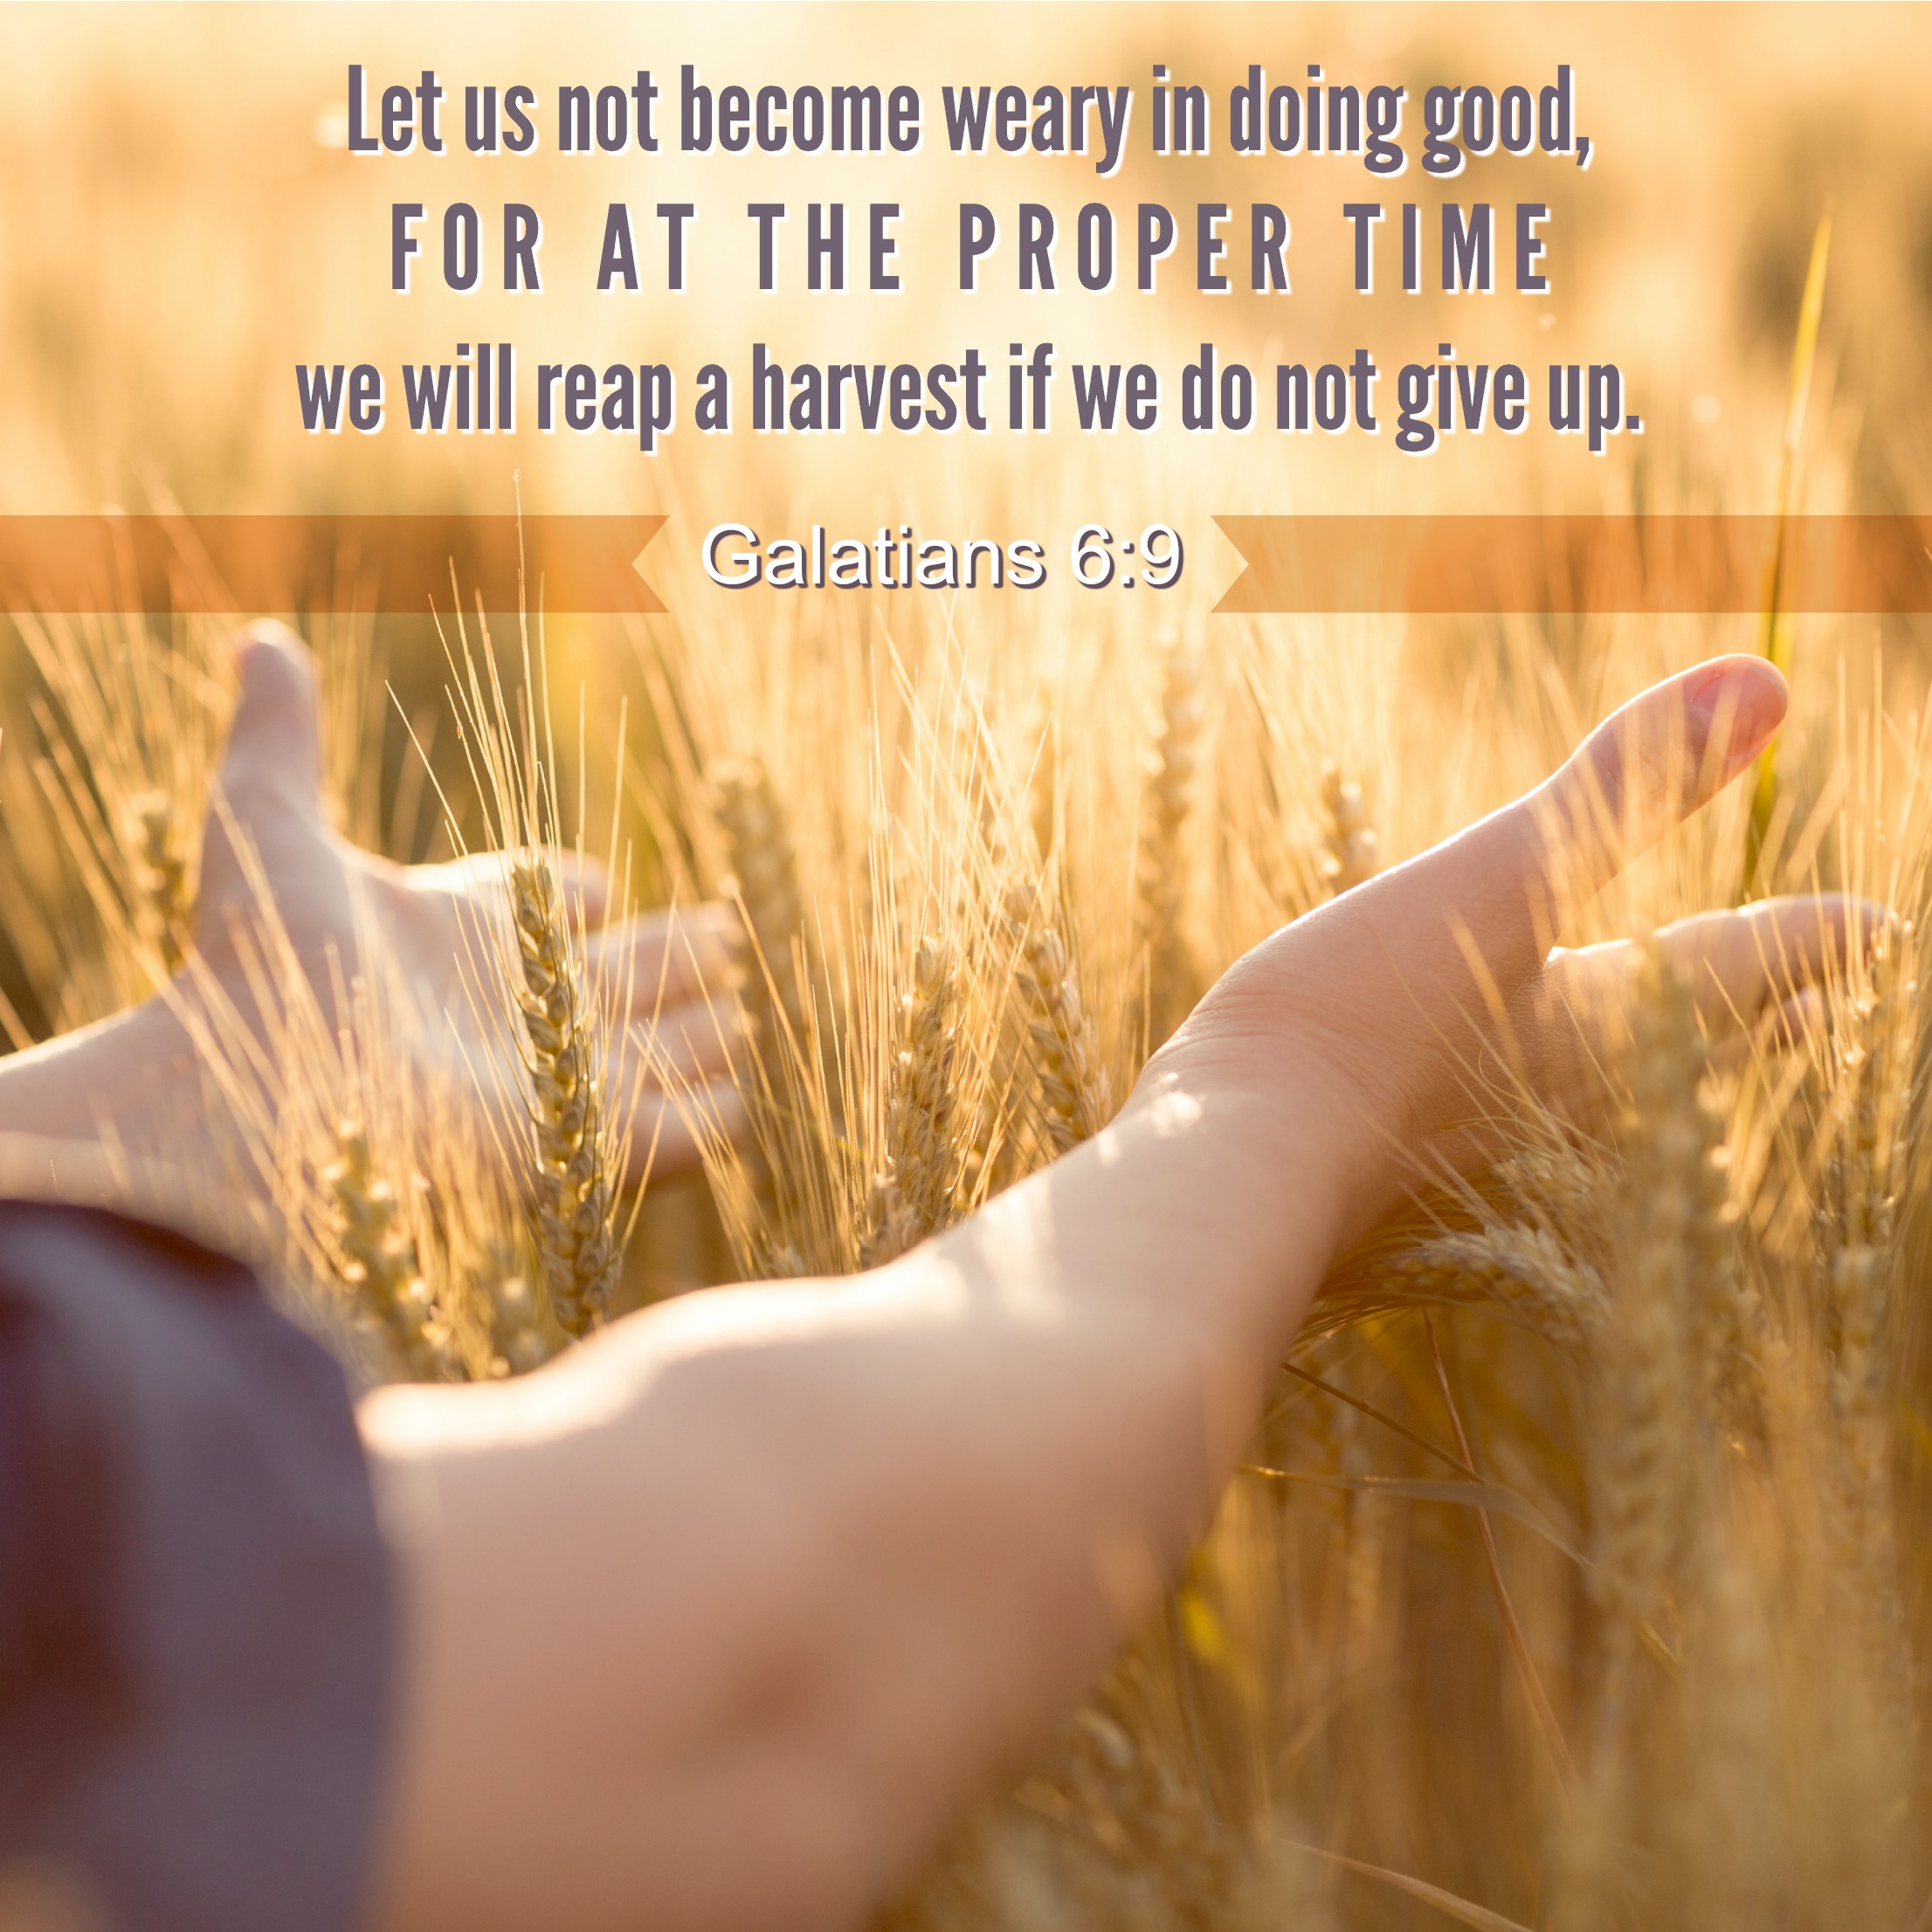 Daily Verse: Galatians 6:9